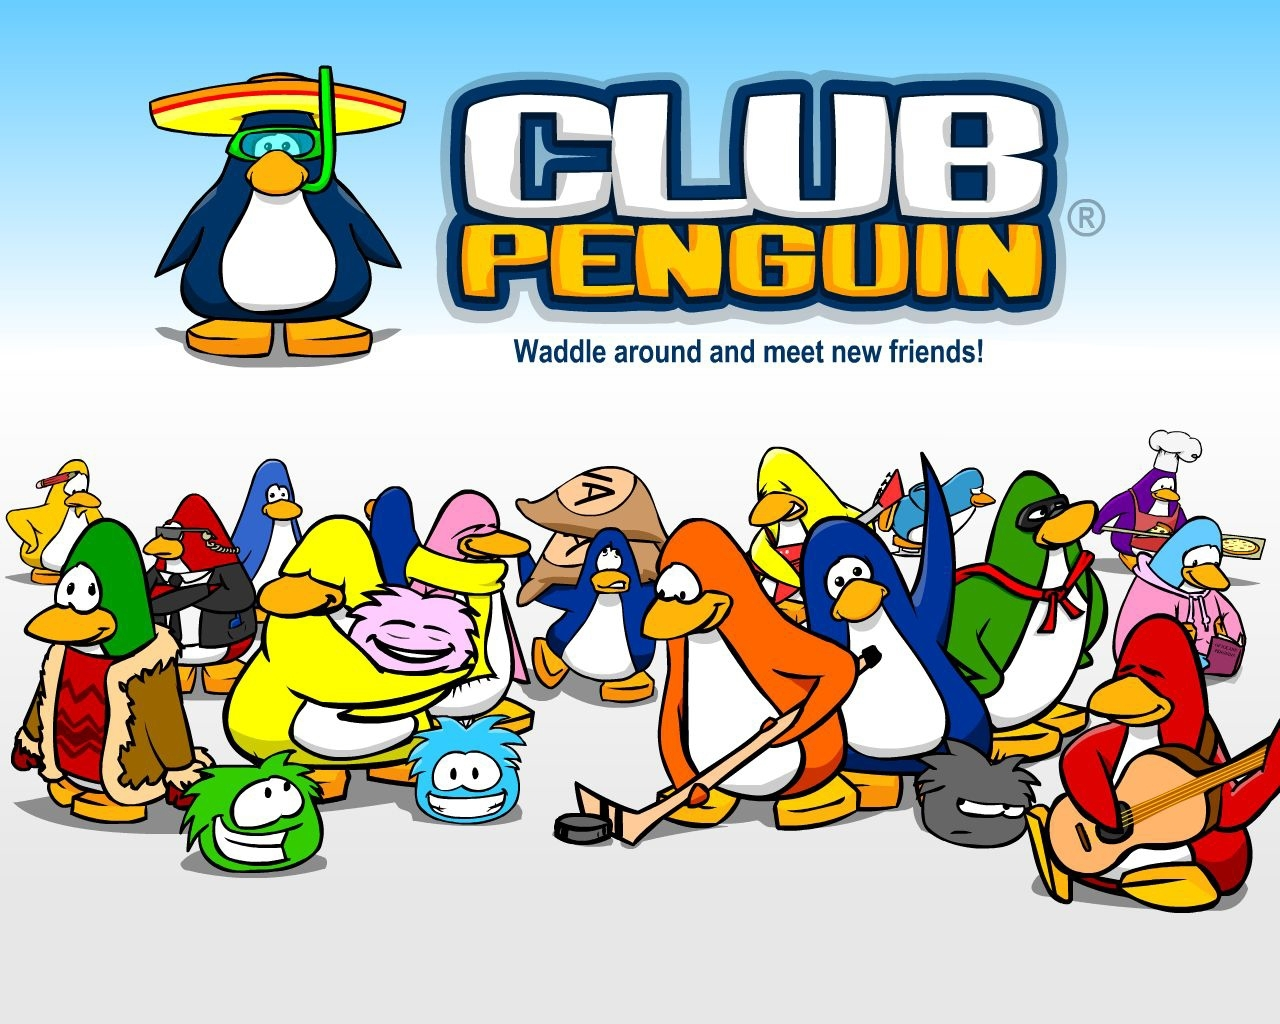 http://2.bp.blogspot.com/_eWpNJ7FCxx0/TKUd7zKPxaI/AAAAAAAAABU/p-SXAQY0gWg/s1600/club-penguin-wallpaper.jpg